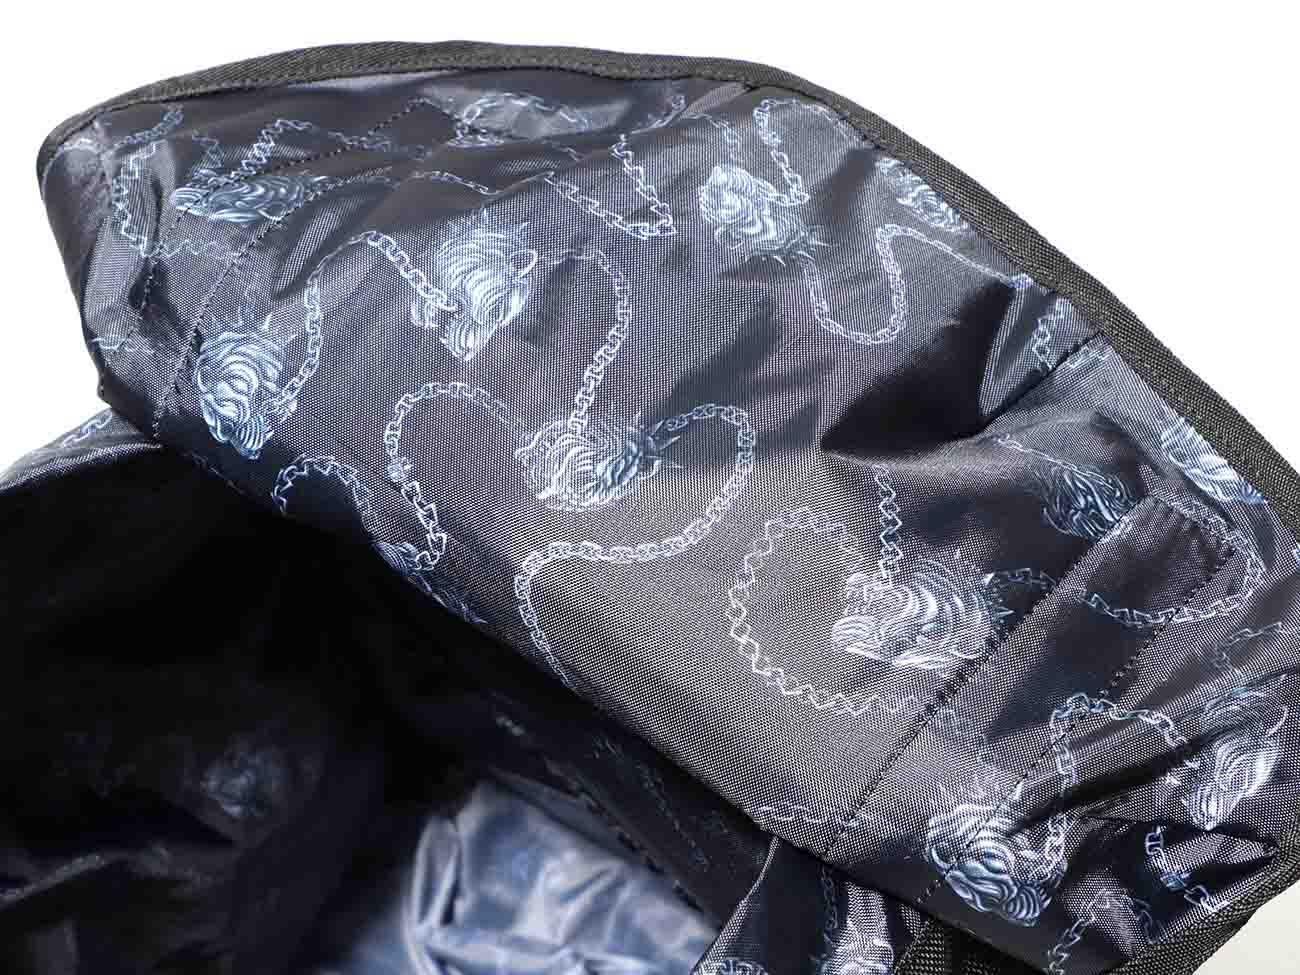 Yohji Yamamoto × New Era 1680-BKPE UTILITY 4POCKET PACK